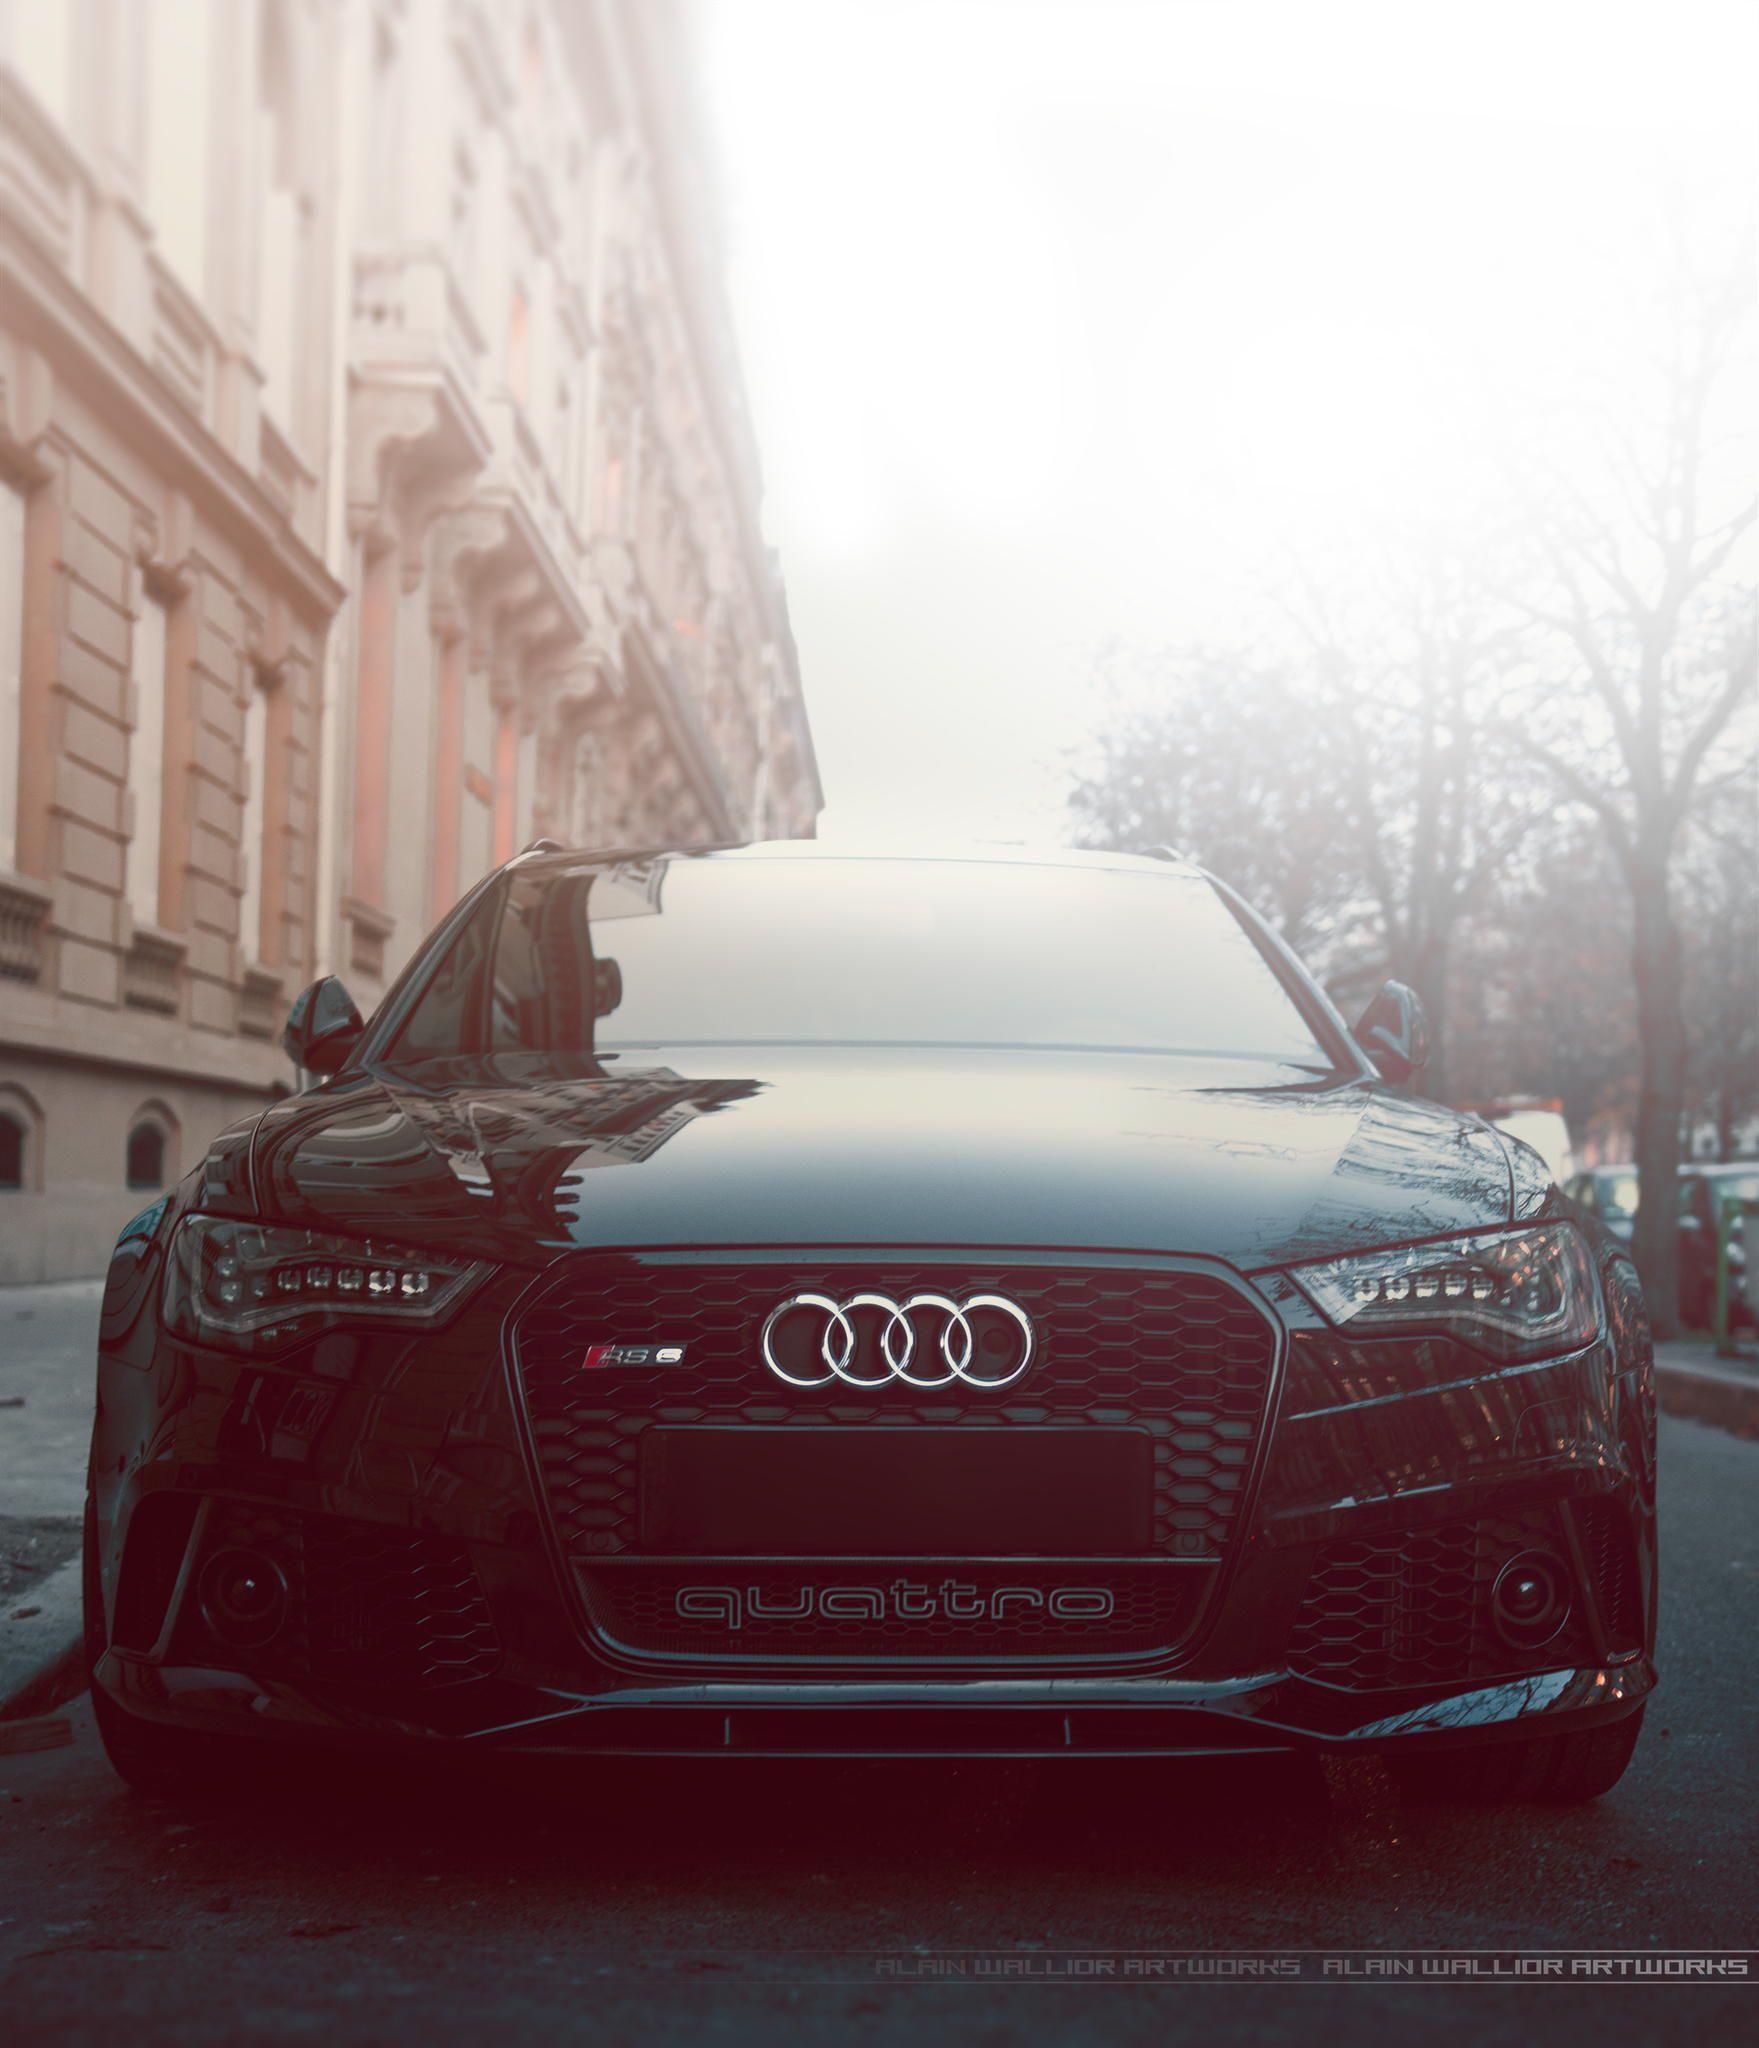 Audi RS6 Avant Cars Pinterest